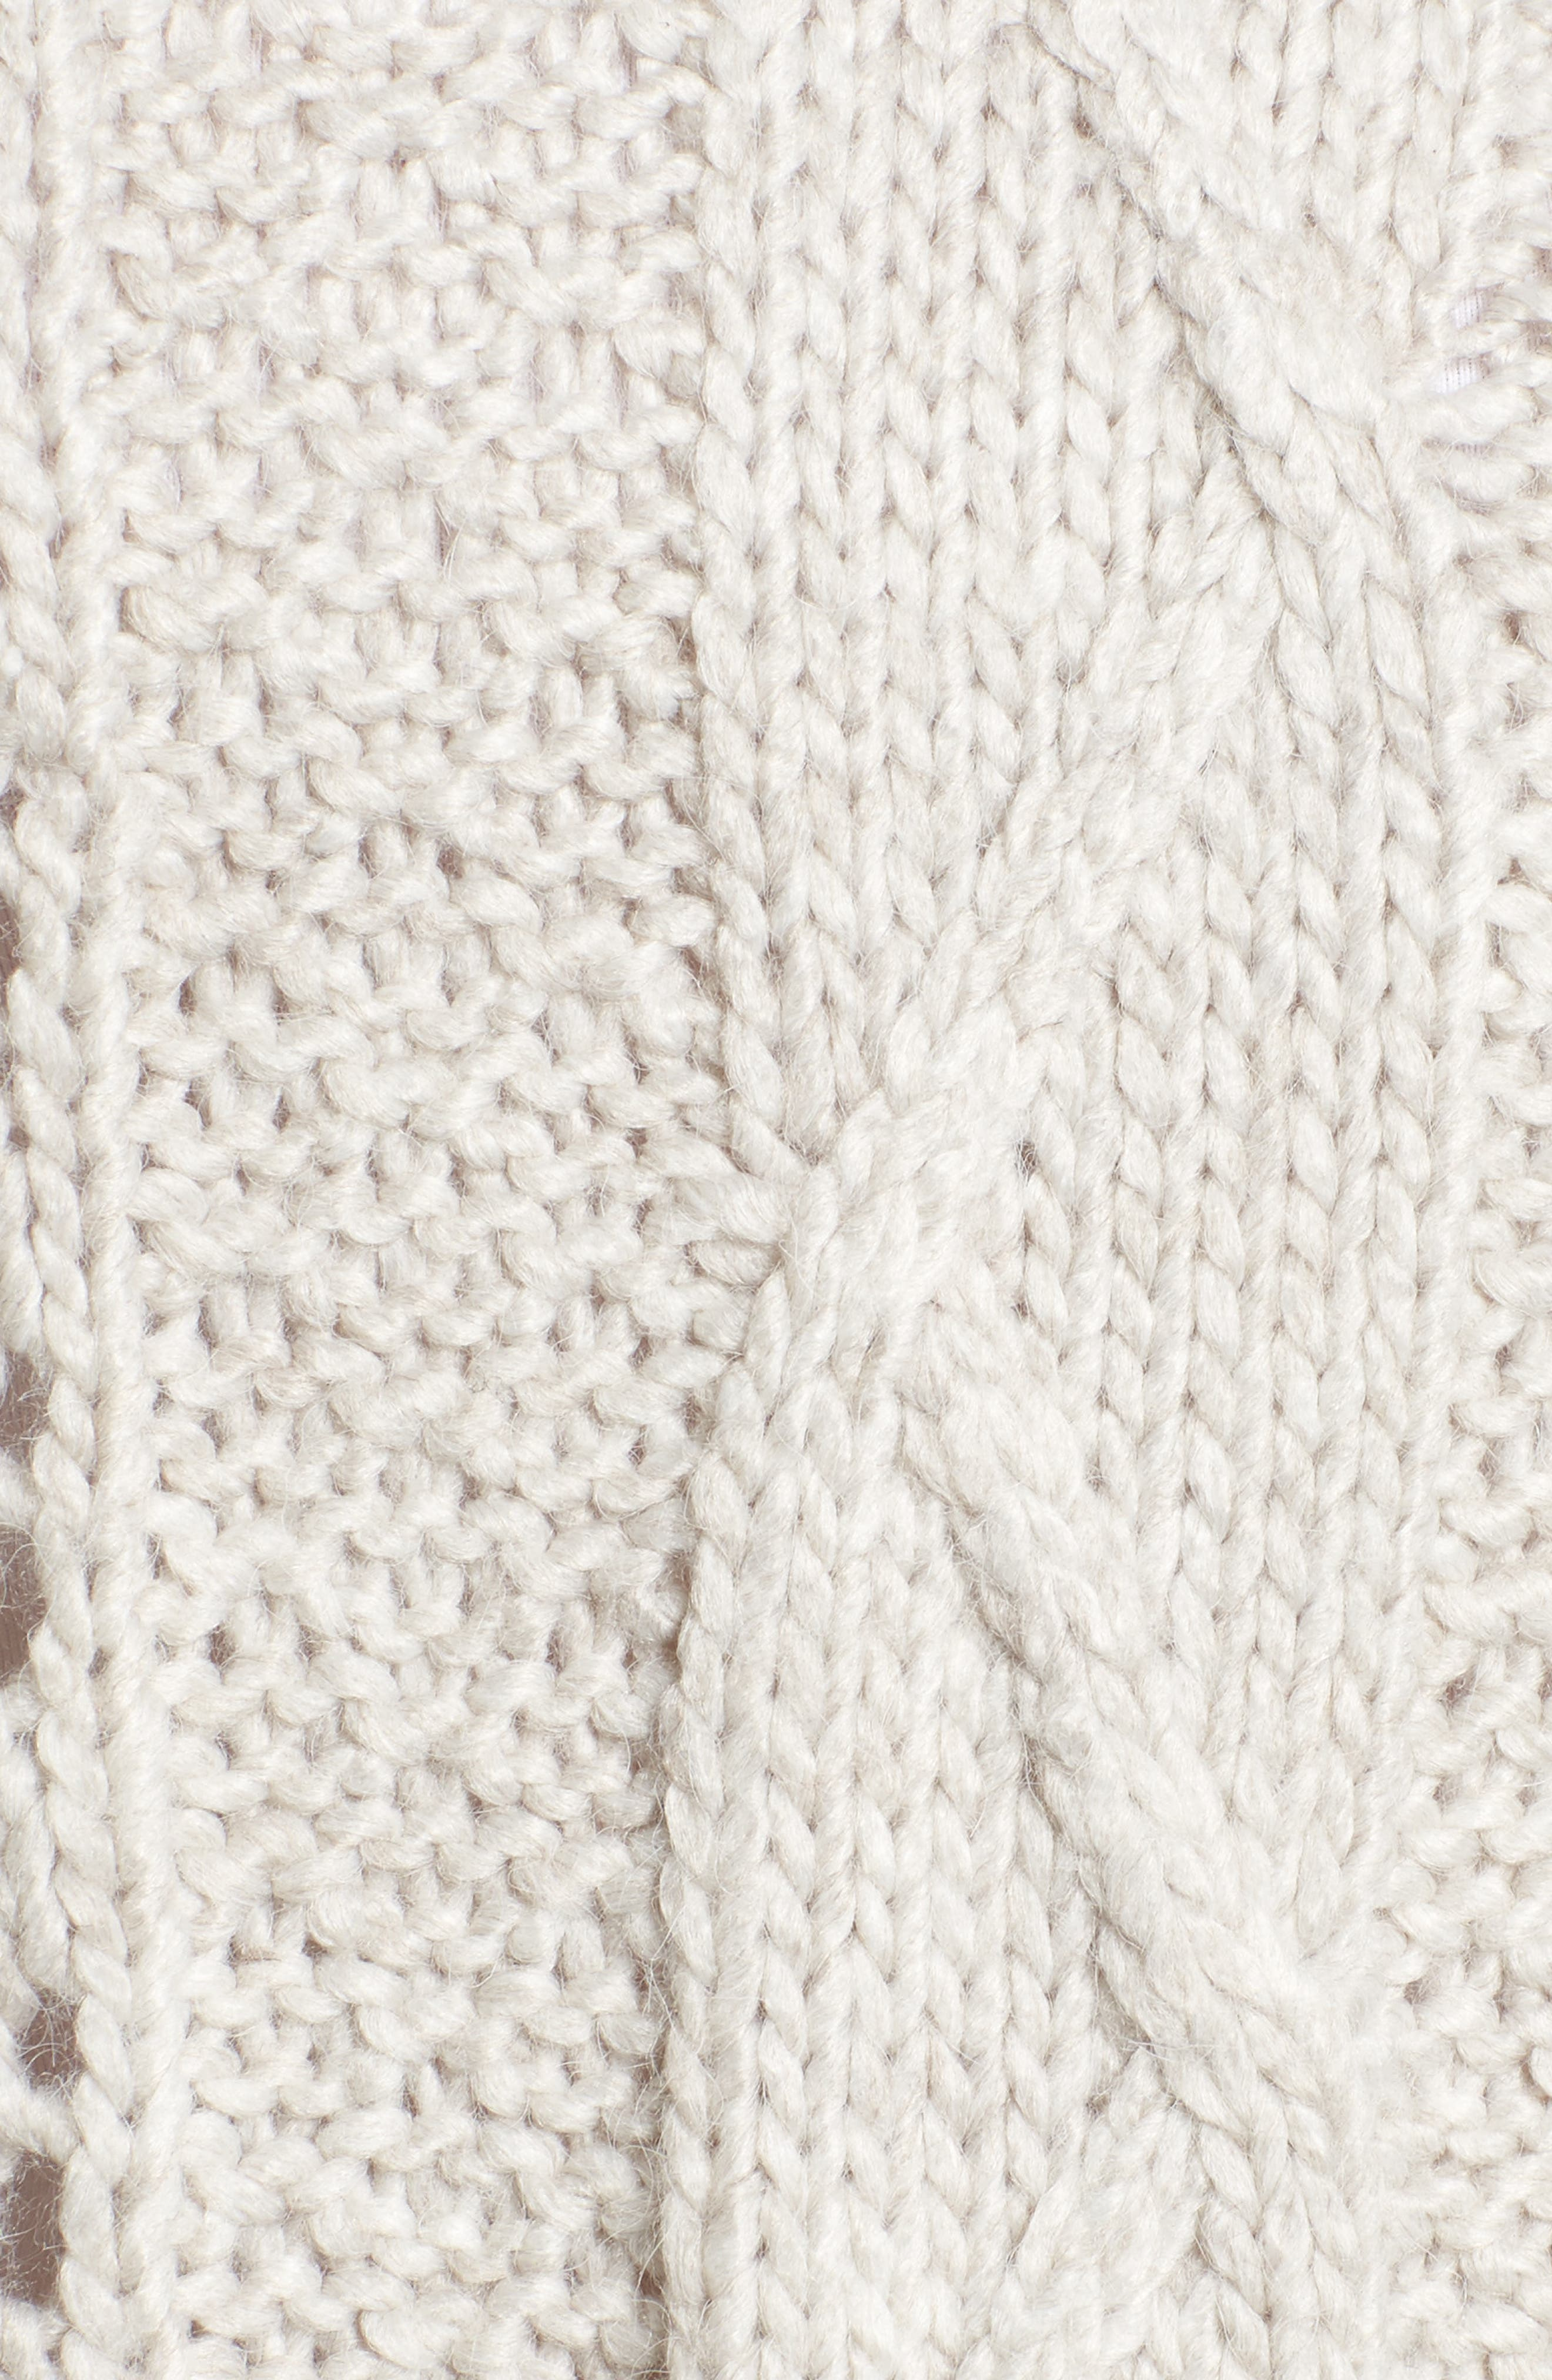 Prilla Fringe Cowl Neck Sweater,                             Alternate thumbnail 5, color,